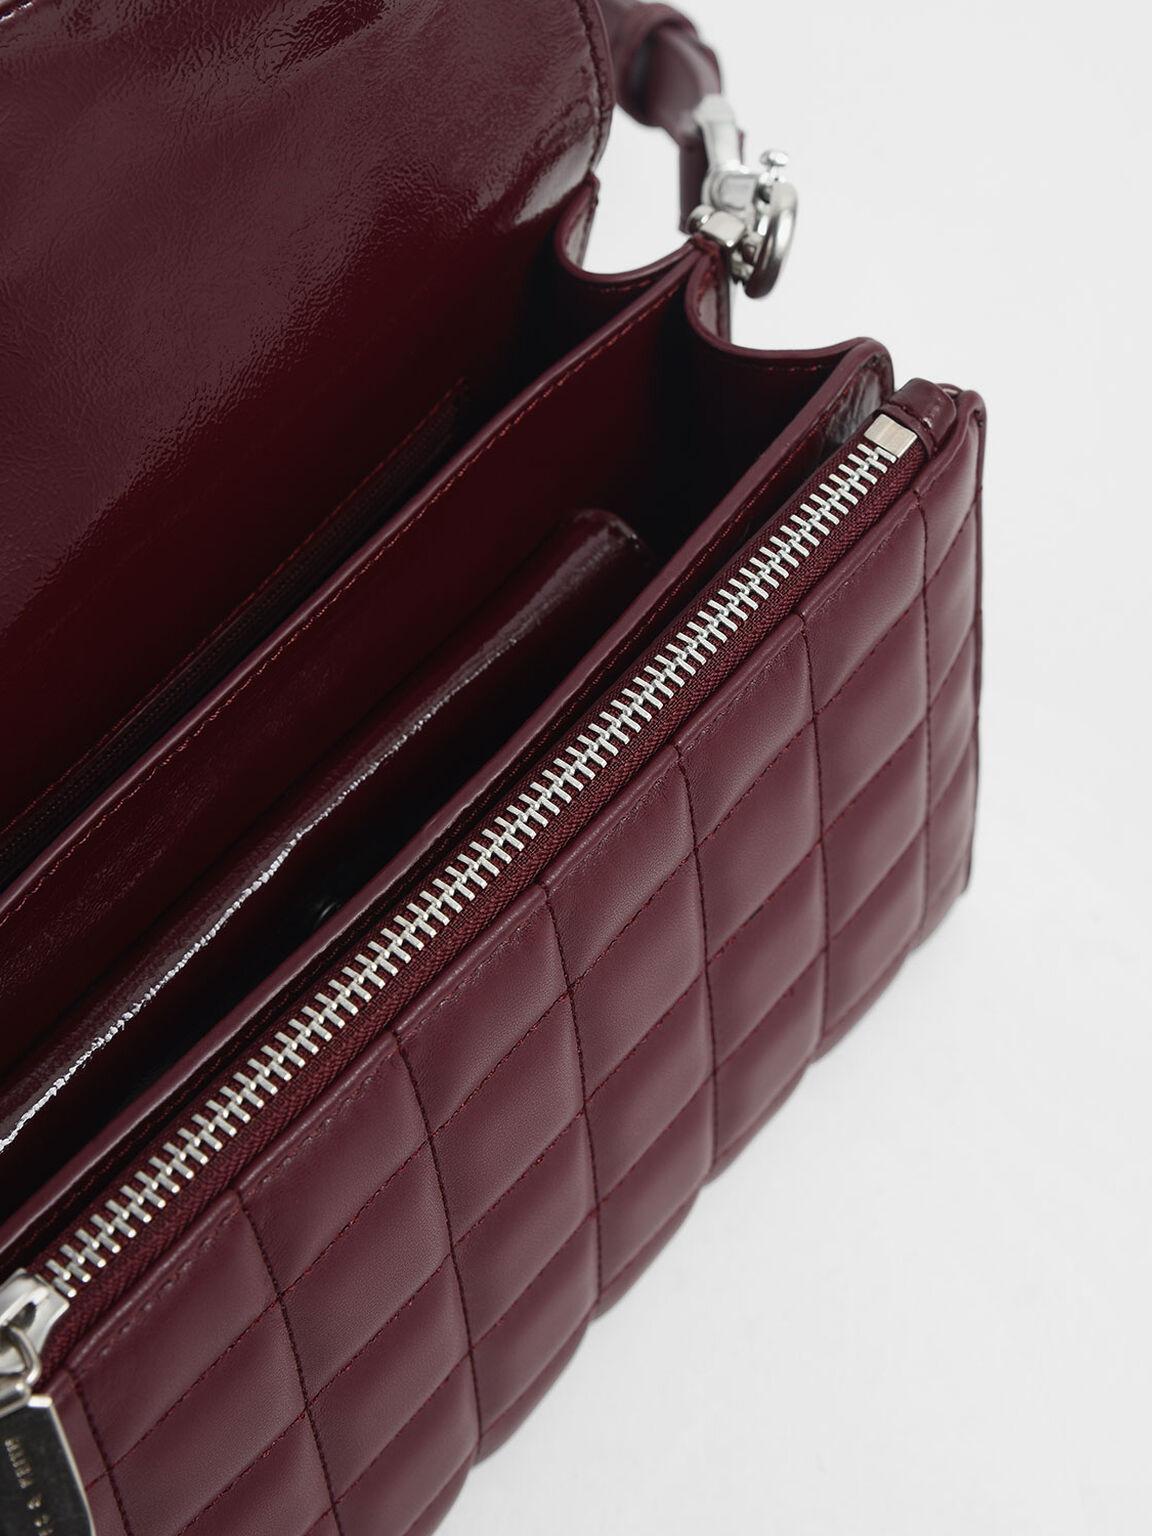 Removable Quilted Pouch Boxy Shoulder Bag, Burgundy, hi-res